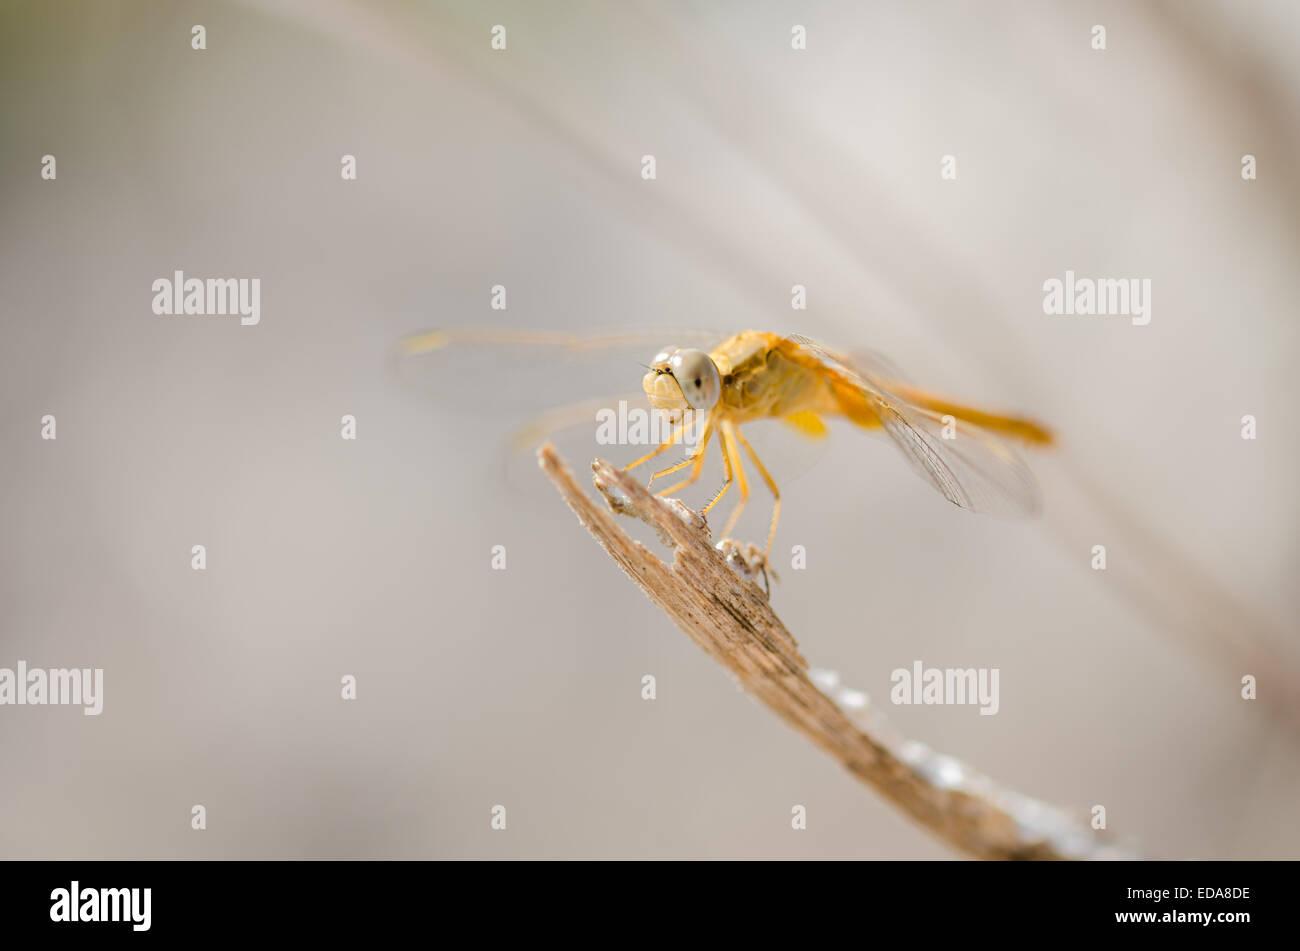 Female Scarlet darter dragonfly (Crocothemis erythraea) resting on a stick. Stock Photo